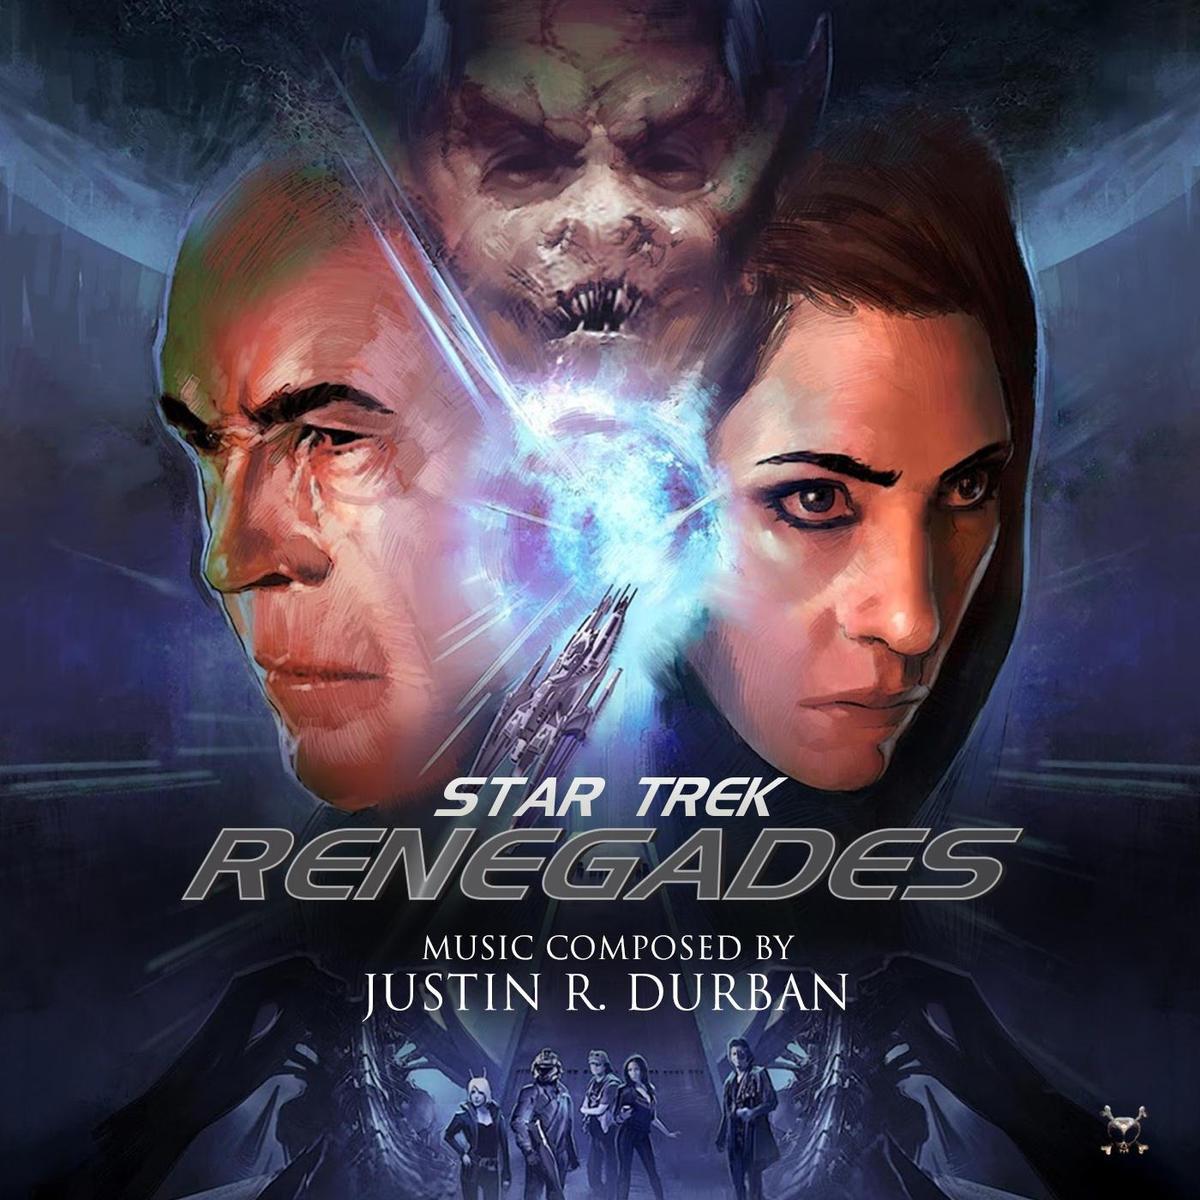 Star trek renegades release date in Perth